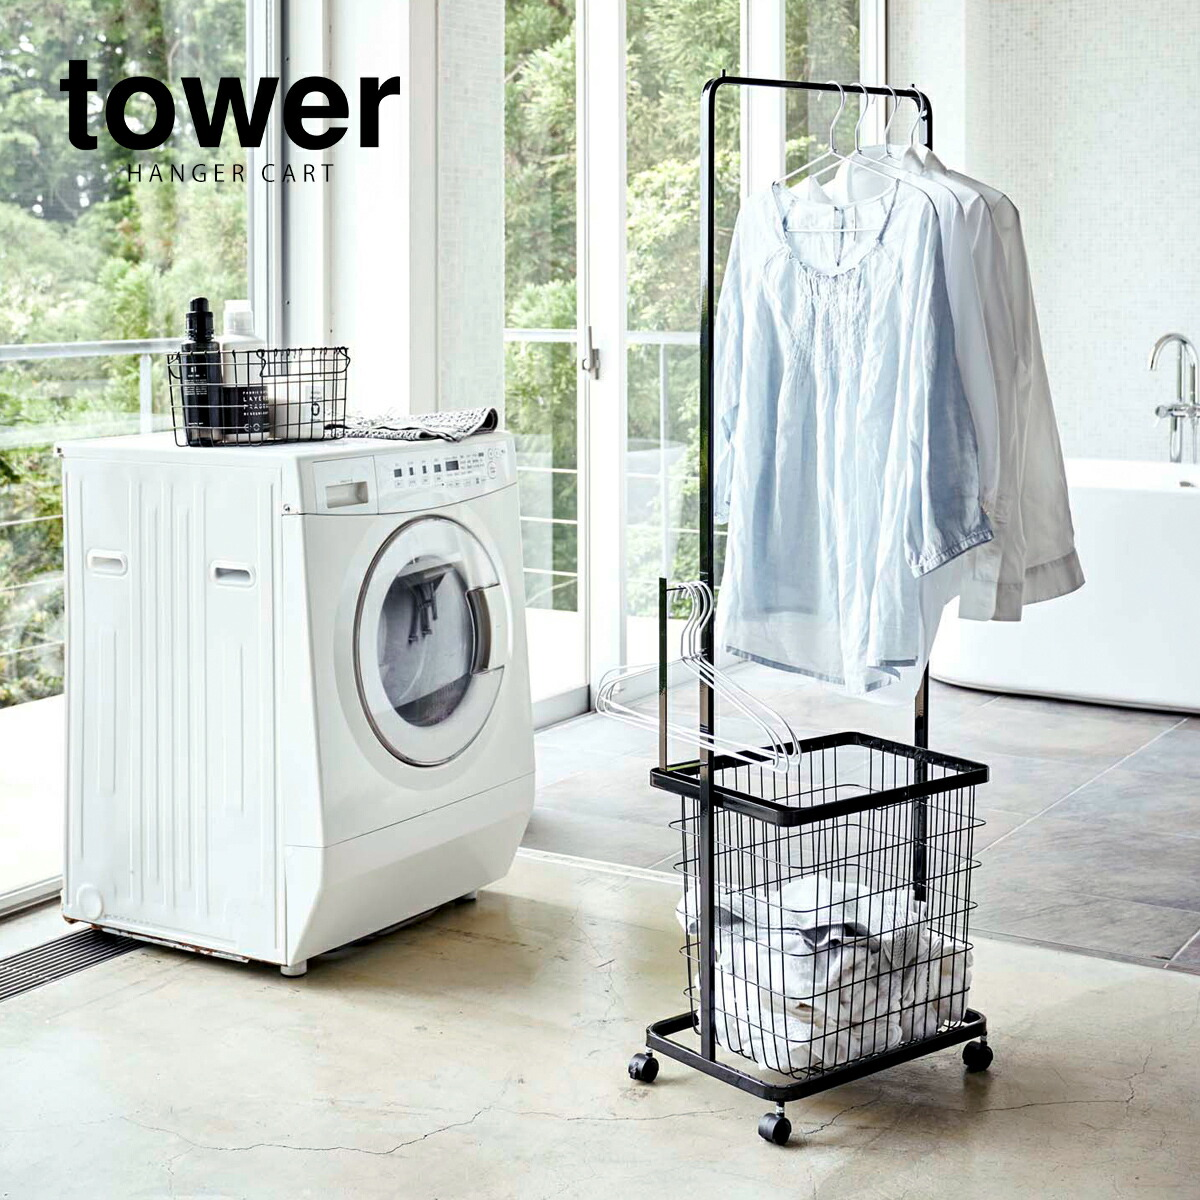 tower / タワー ランドリーハンガーカート セット 洗濯かご 部屋干し 一時干し 掛け収納